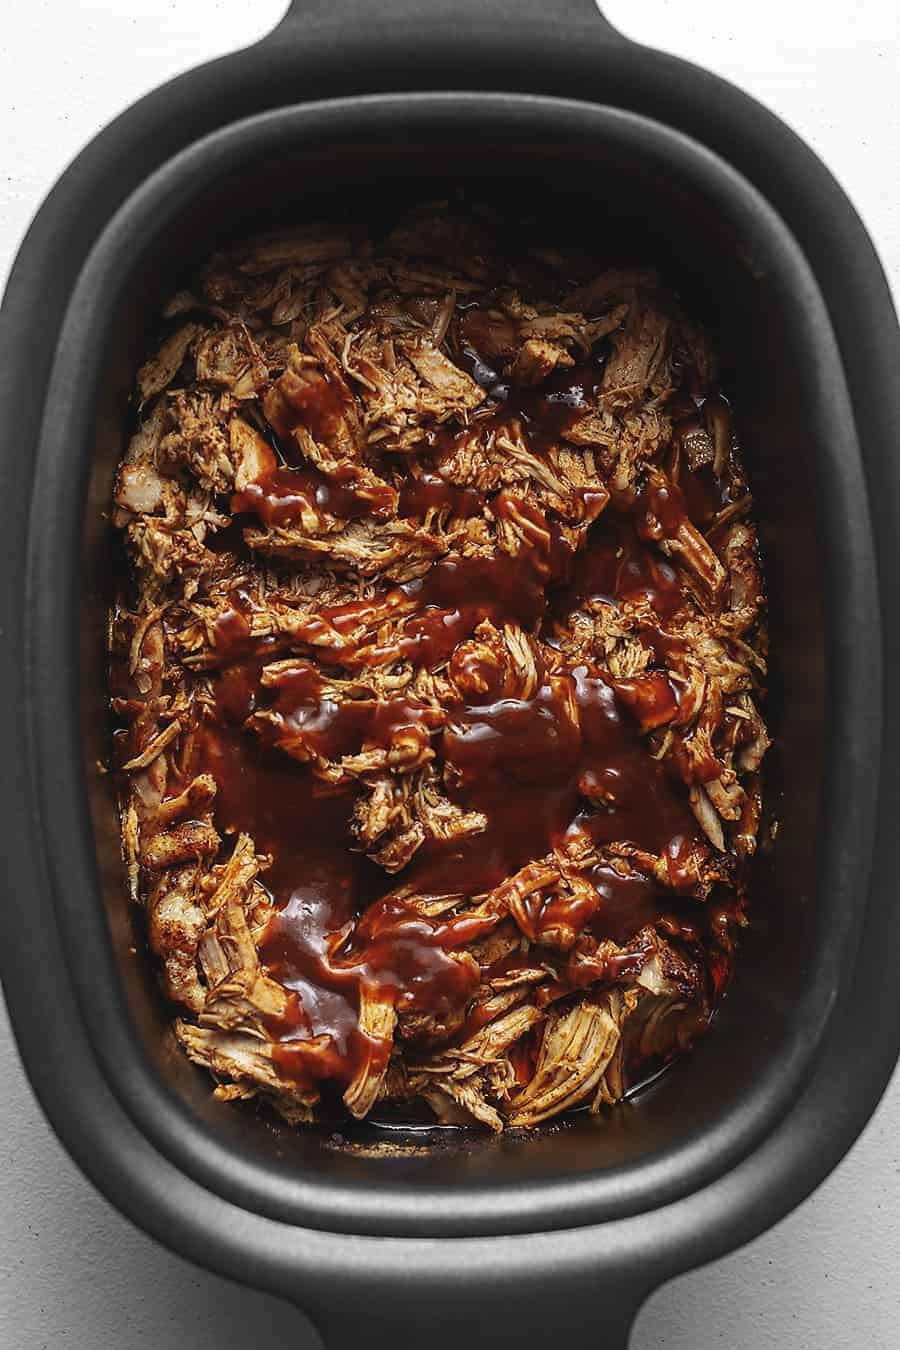 Pork Tenderloin Recipes In Crockpot Slow Cooker Keto  Crock Pot Pork Loin BBQ Pulled Pork • Low Carb with Jennifer